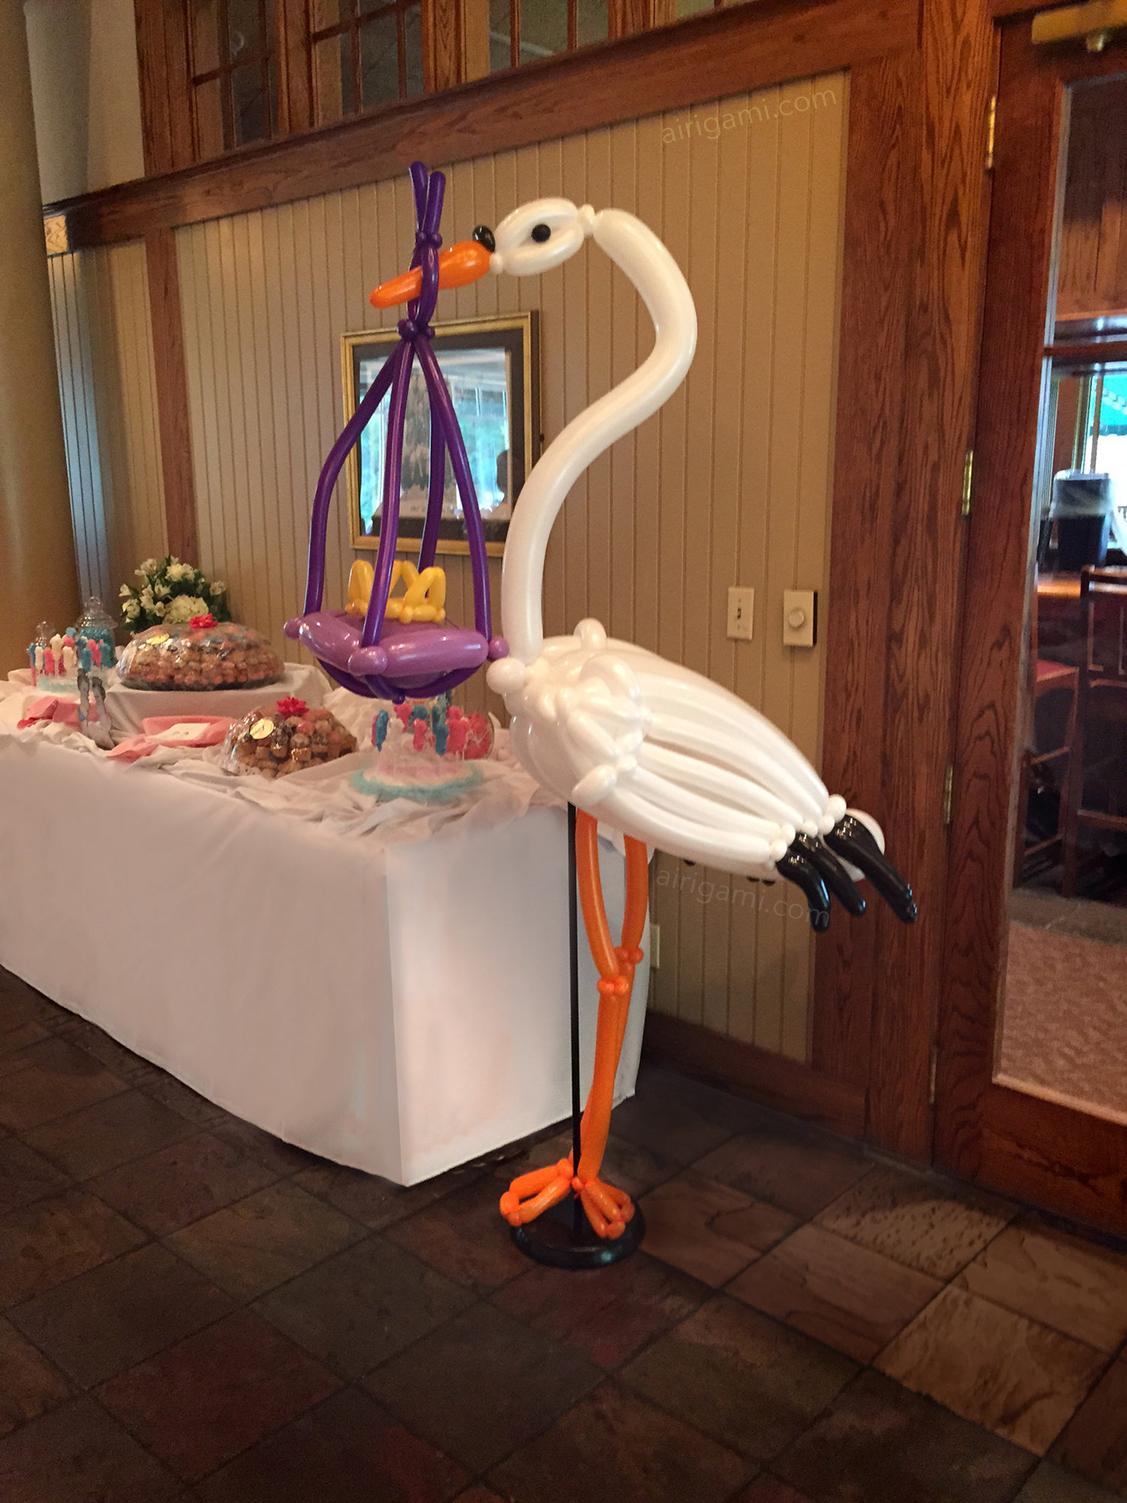 Airigami-balloon-sculpture-stork.jpg